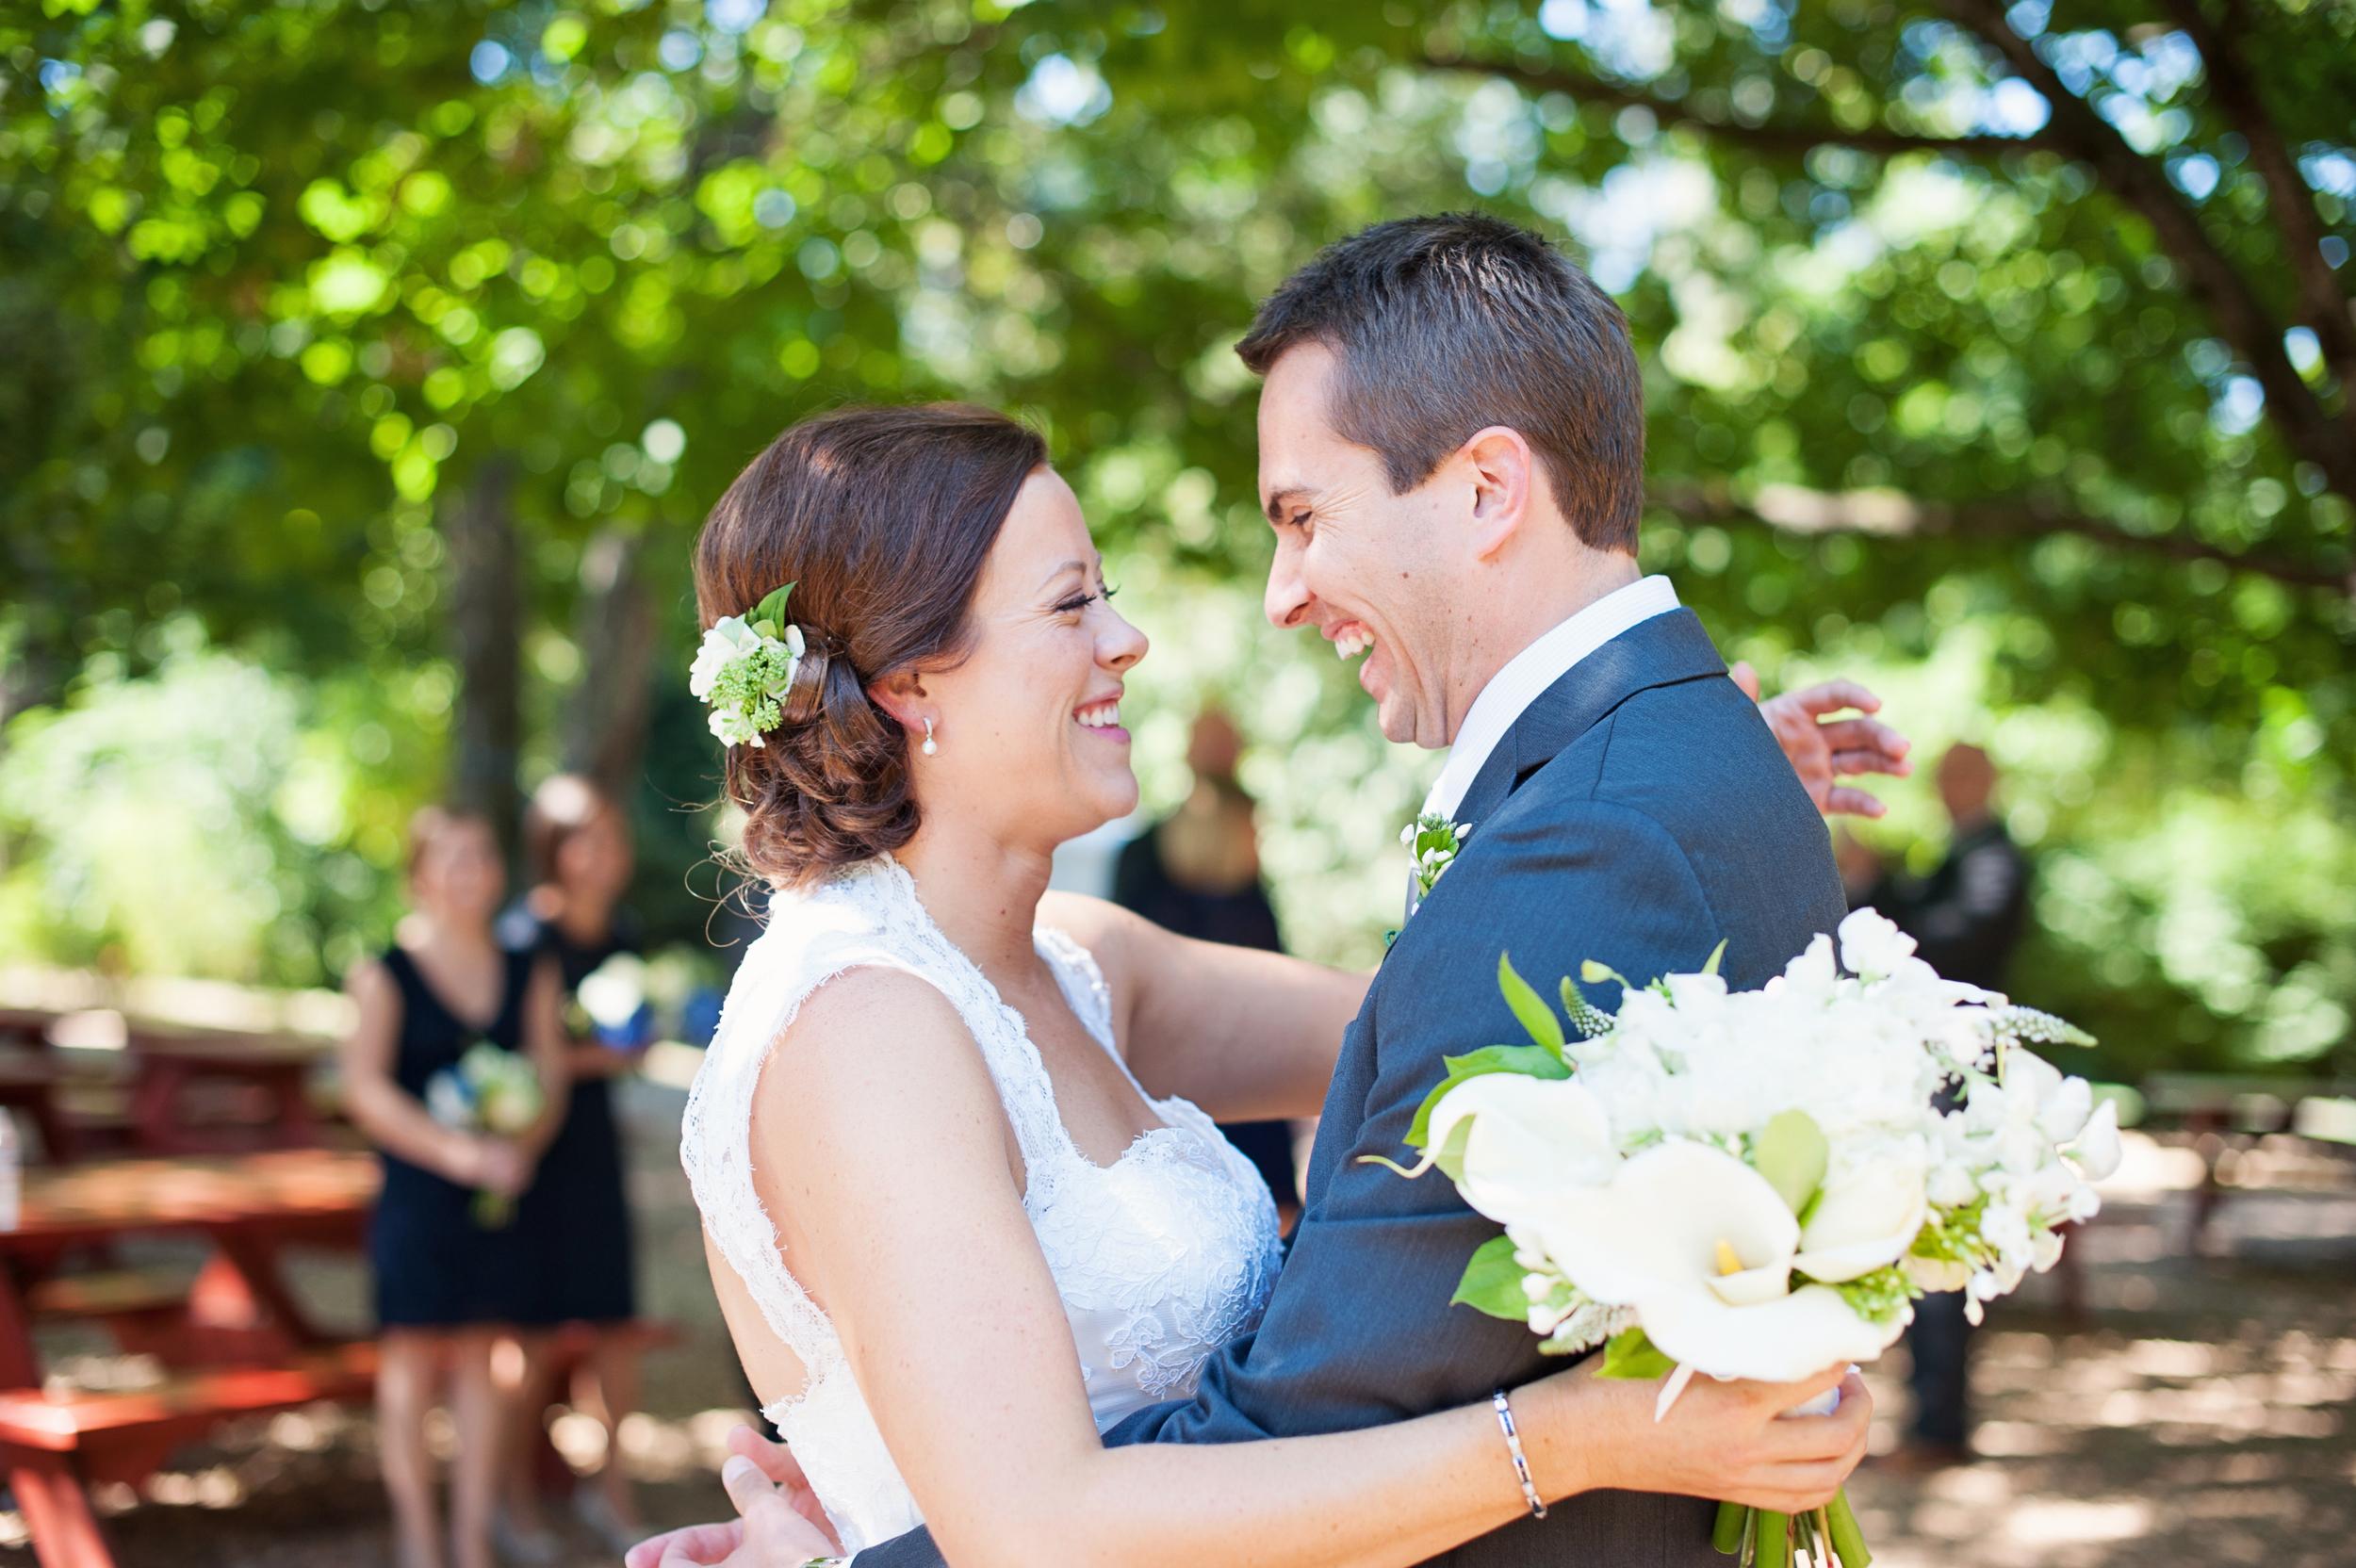 dselbak_weddings_100